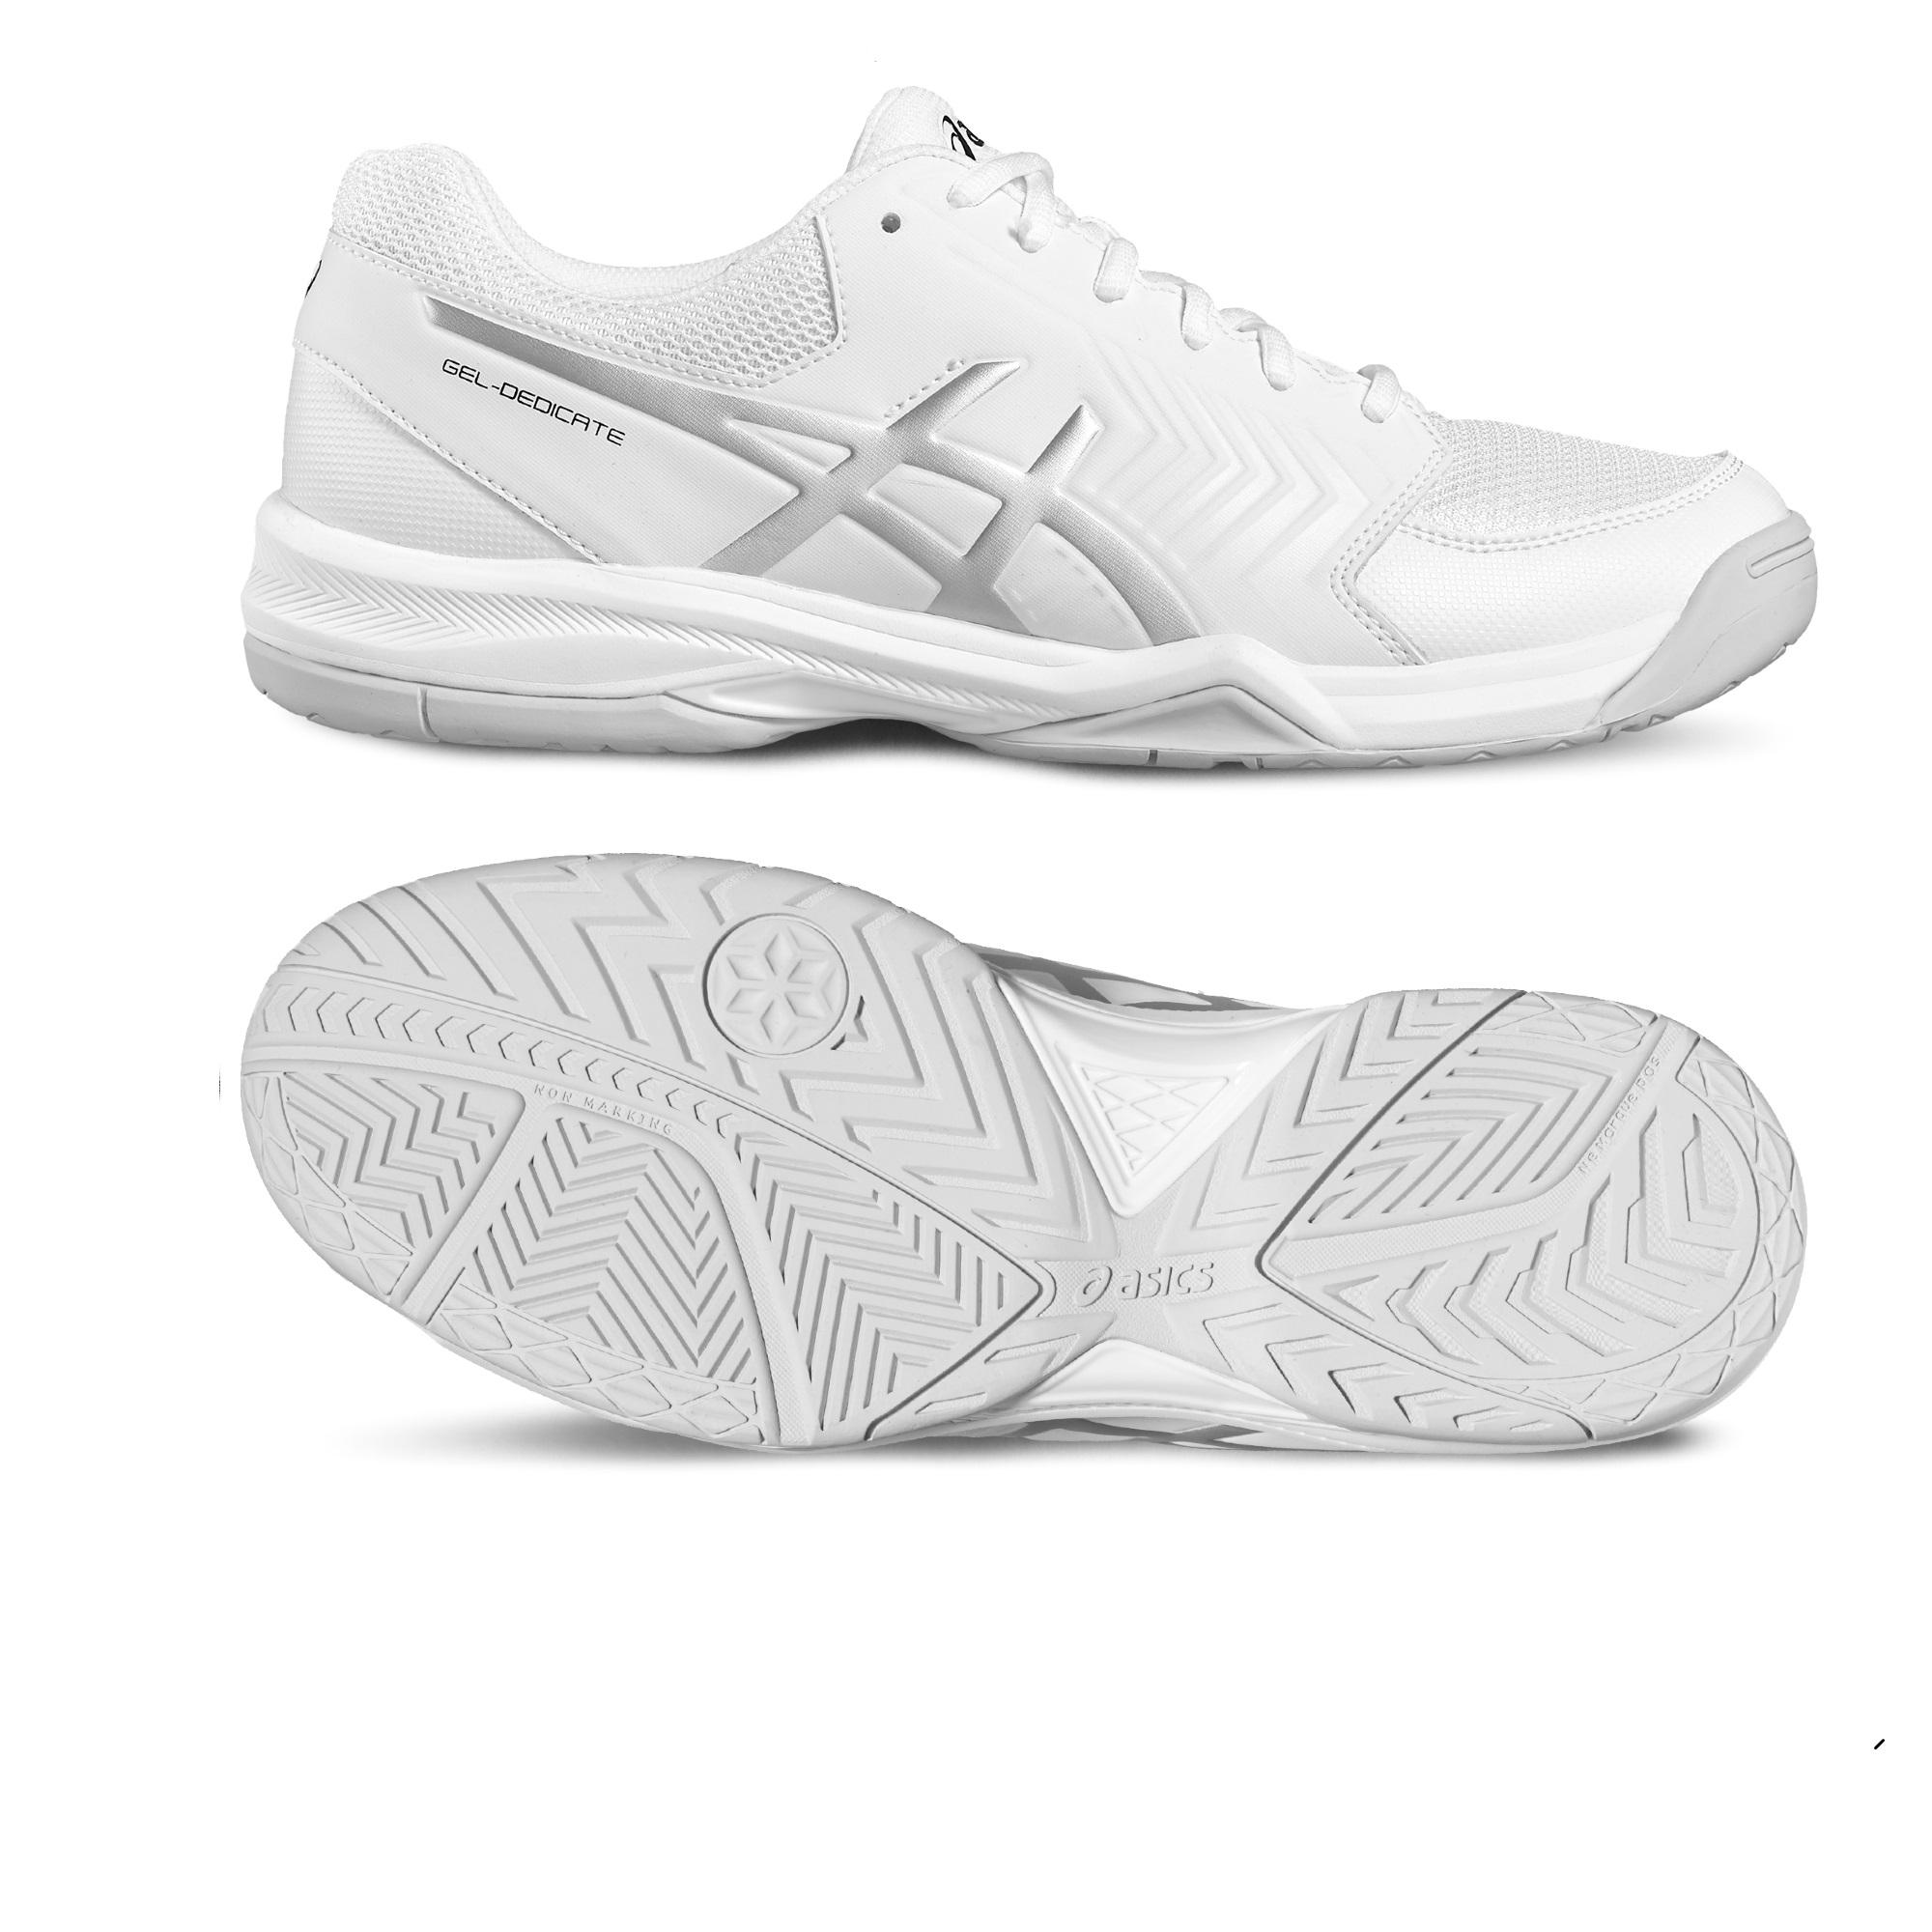 Asics GelDedicate 5 Mens Tennis Shoes  WhiteSilver 11 UK